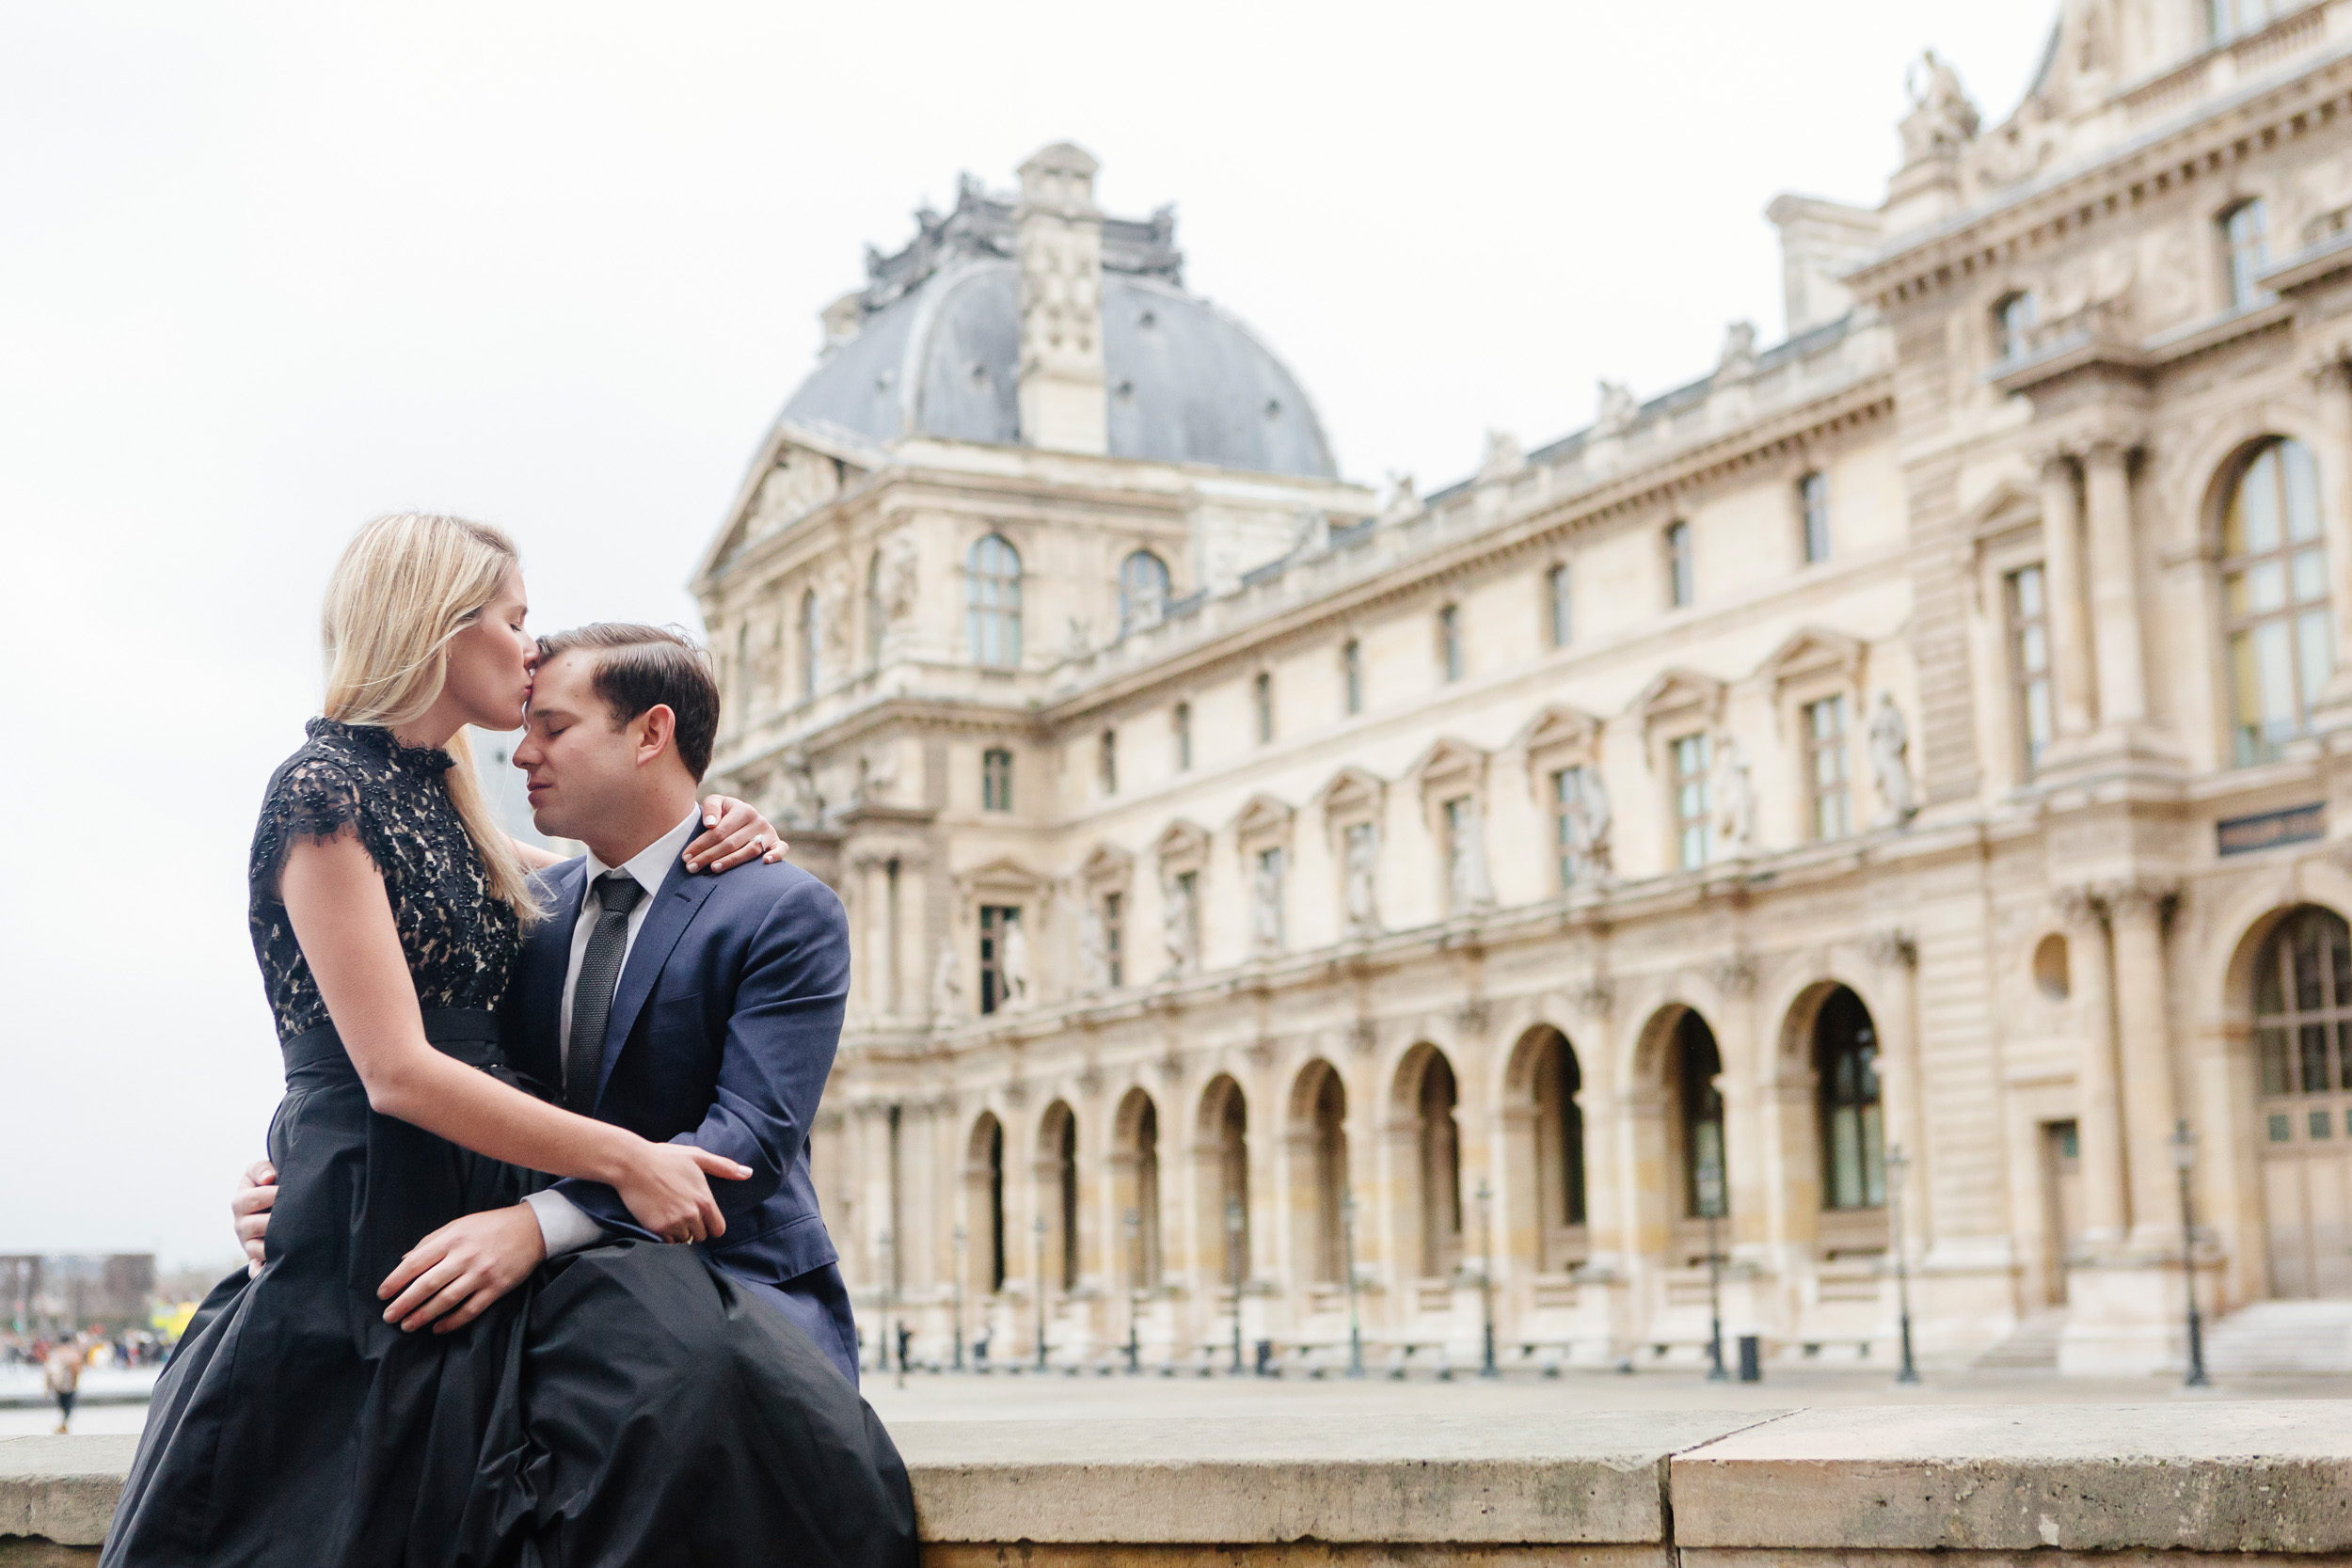 Paris vacation couple portrait kissing in the courtyard of Louvre Museum captured by Paris Photographer Federico Guendel www.iheartparis.fr